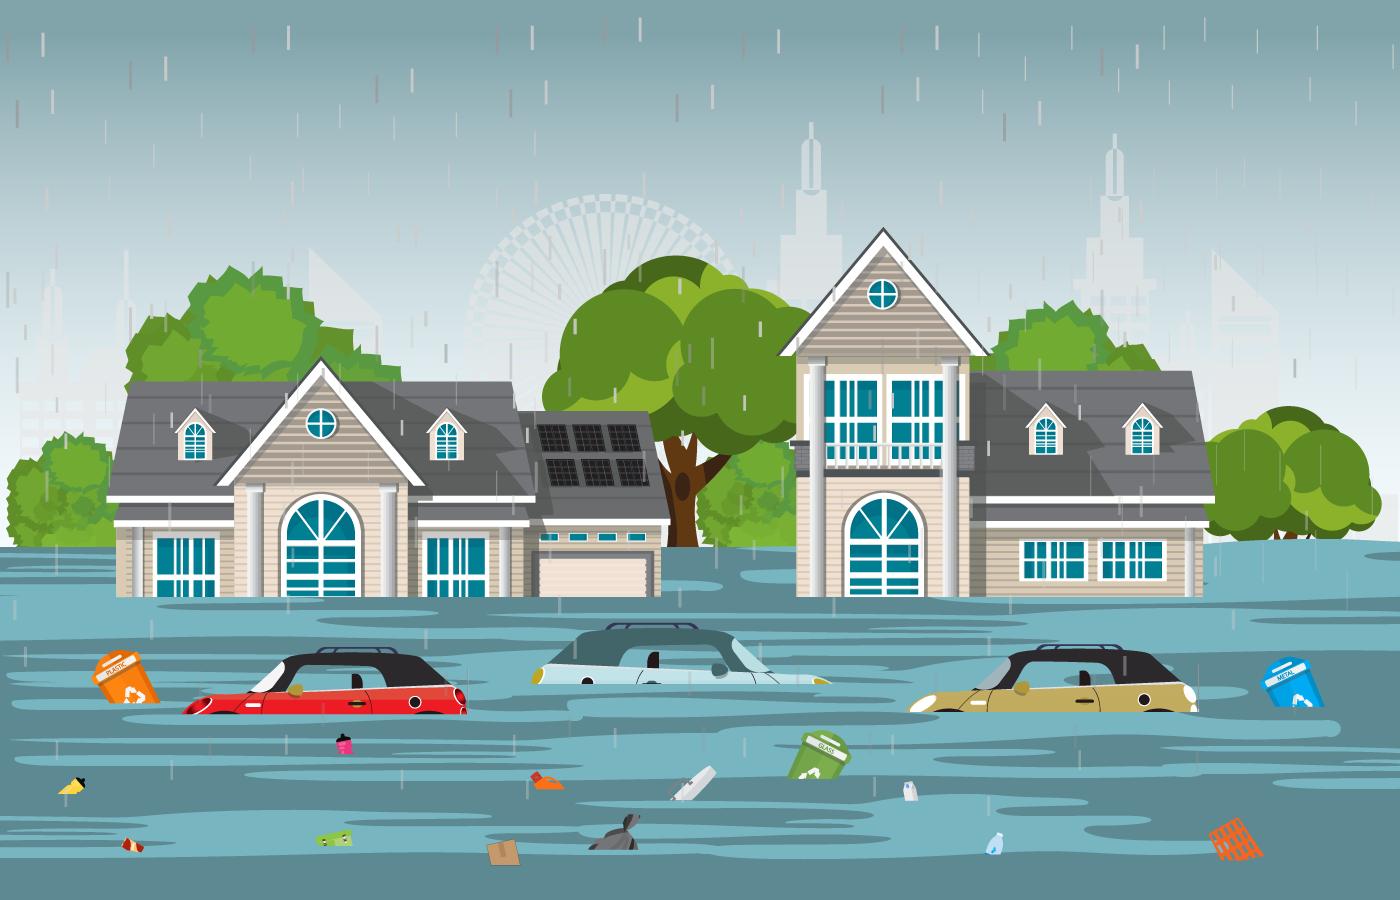 Cartoon houses and cars flooded in neighborhood